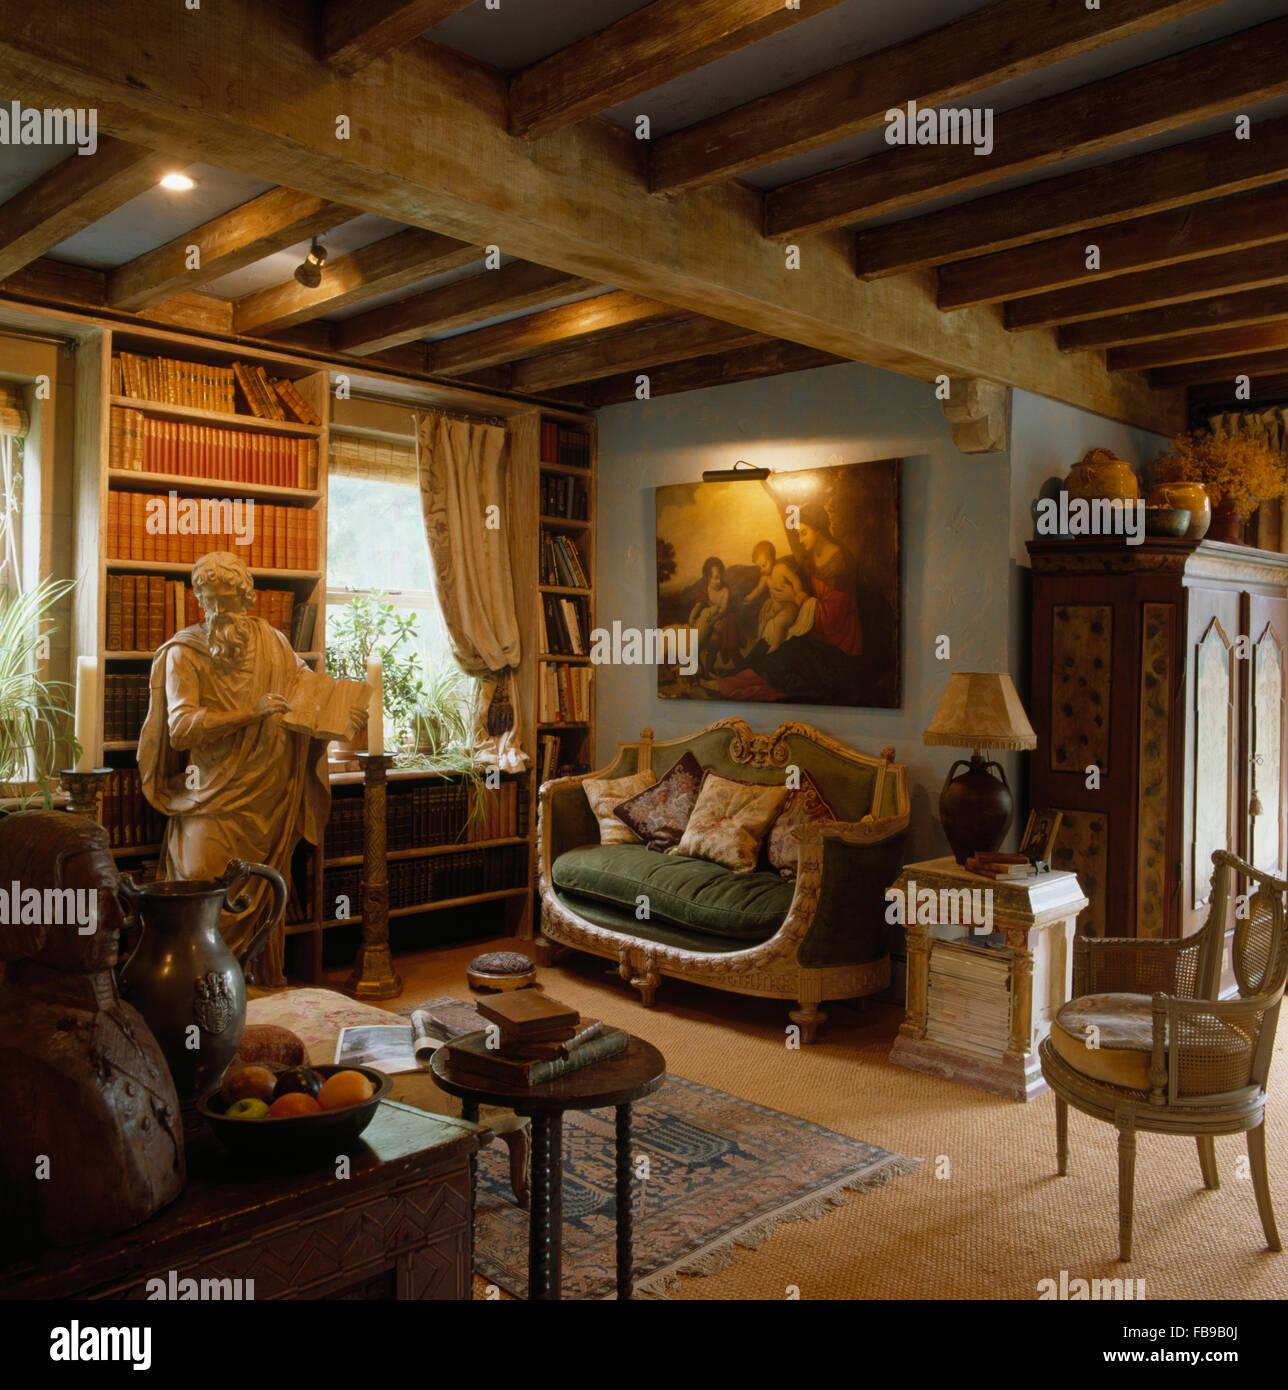 Pittura sopra di piccole dimensioni in stile francese divano in anni ...